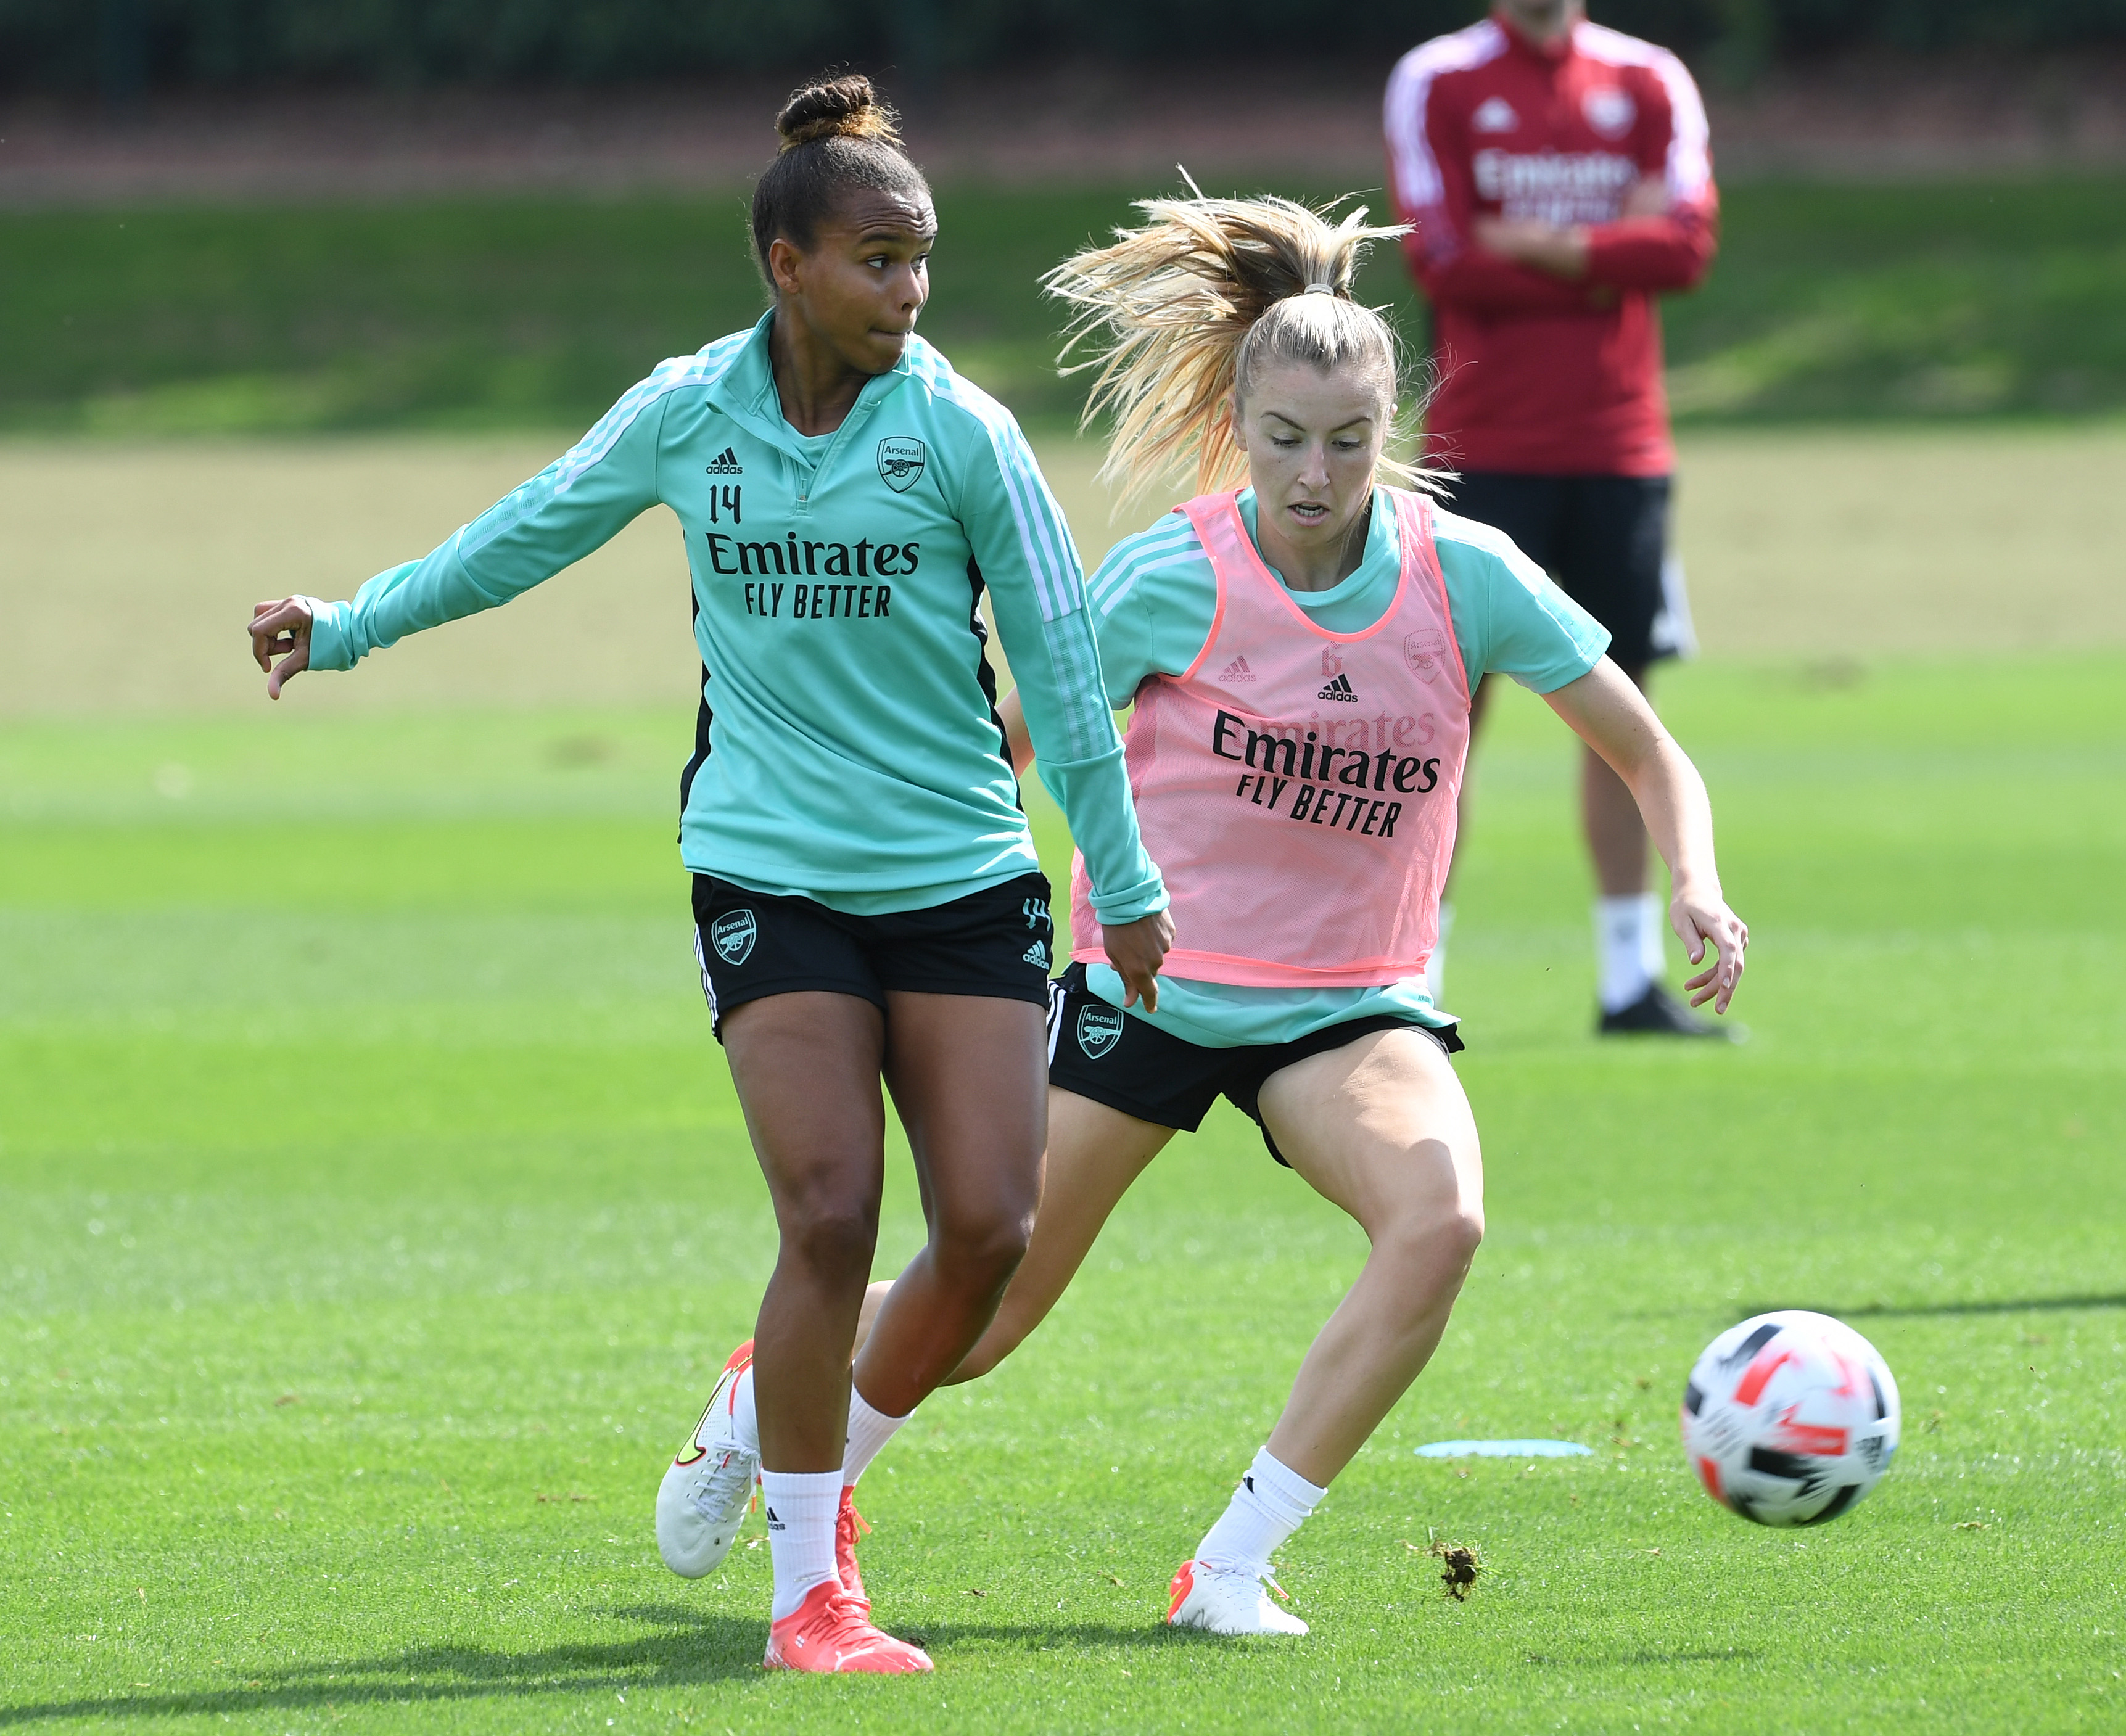 Arsenal Women's Training Session